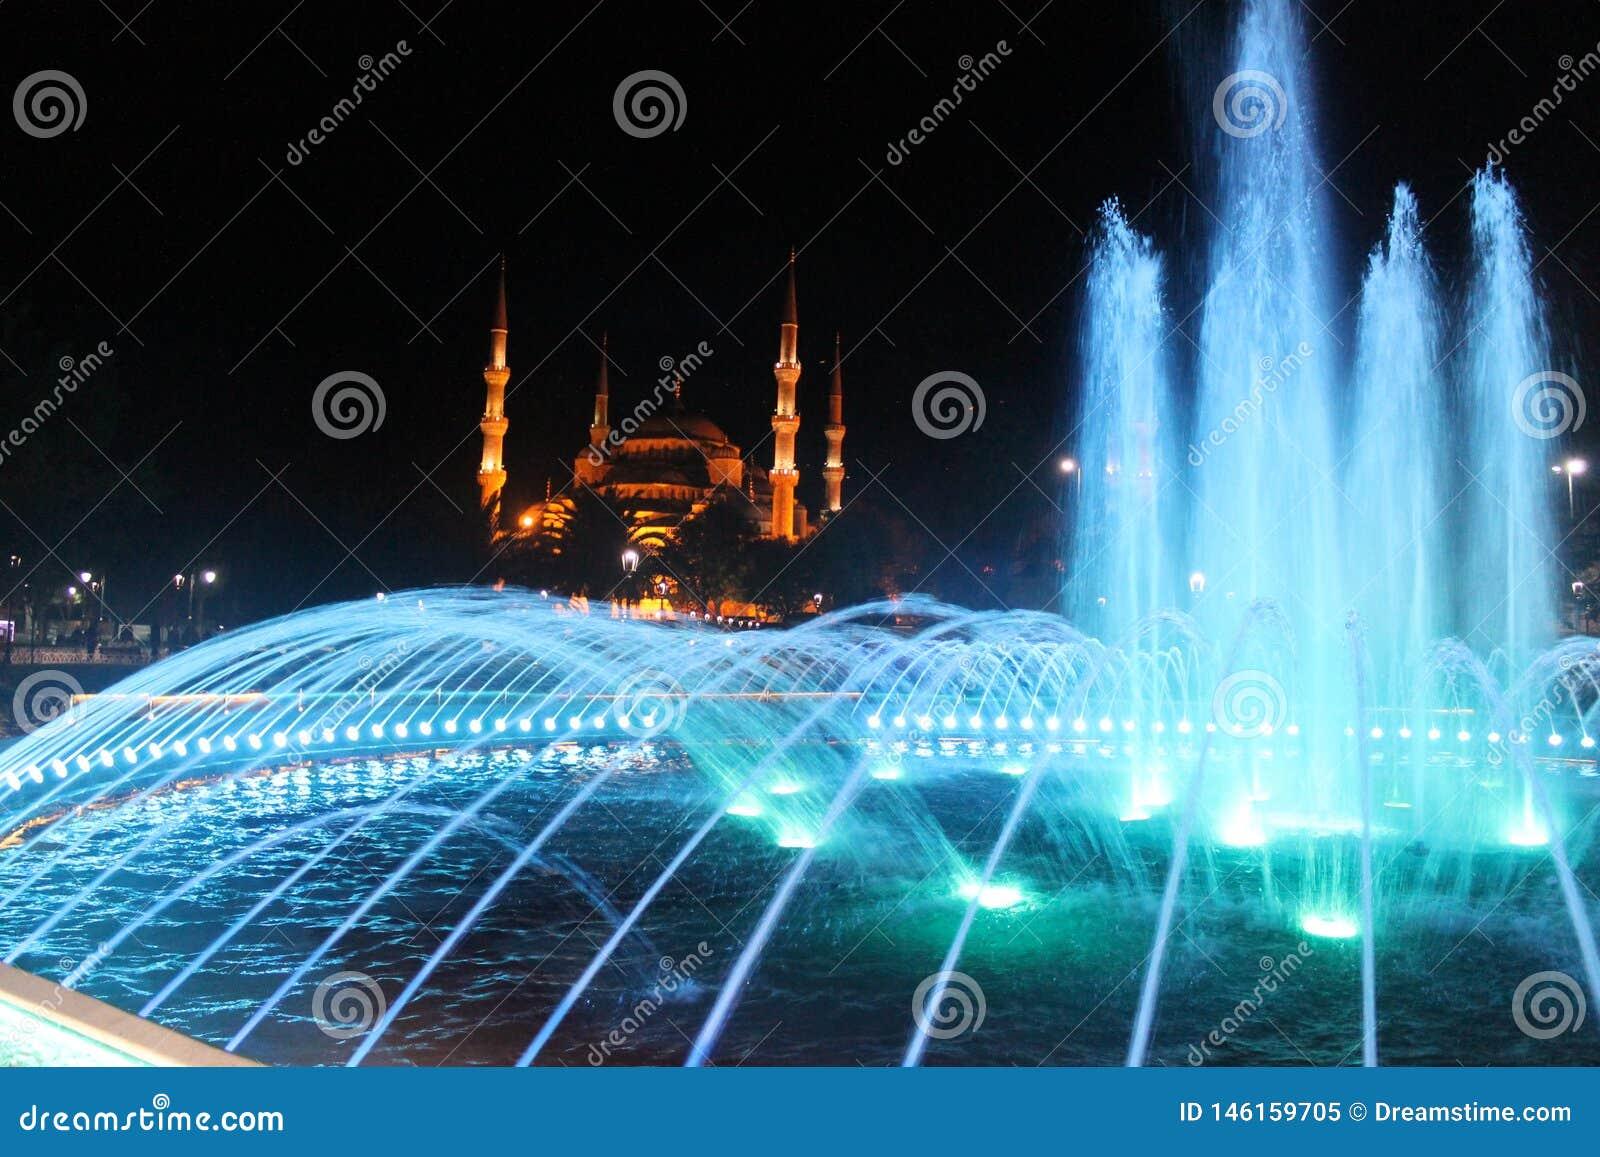 Стамбул - красочный фонтан